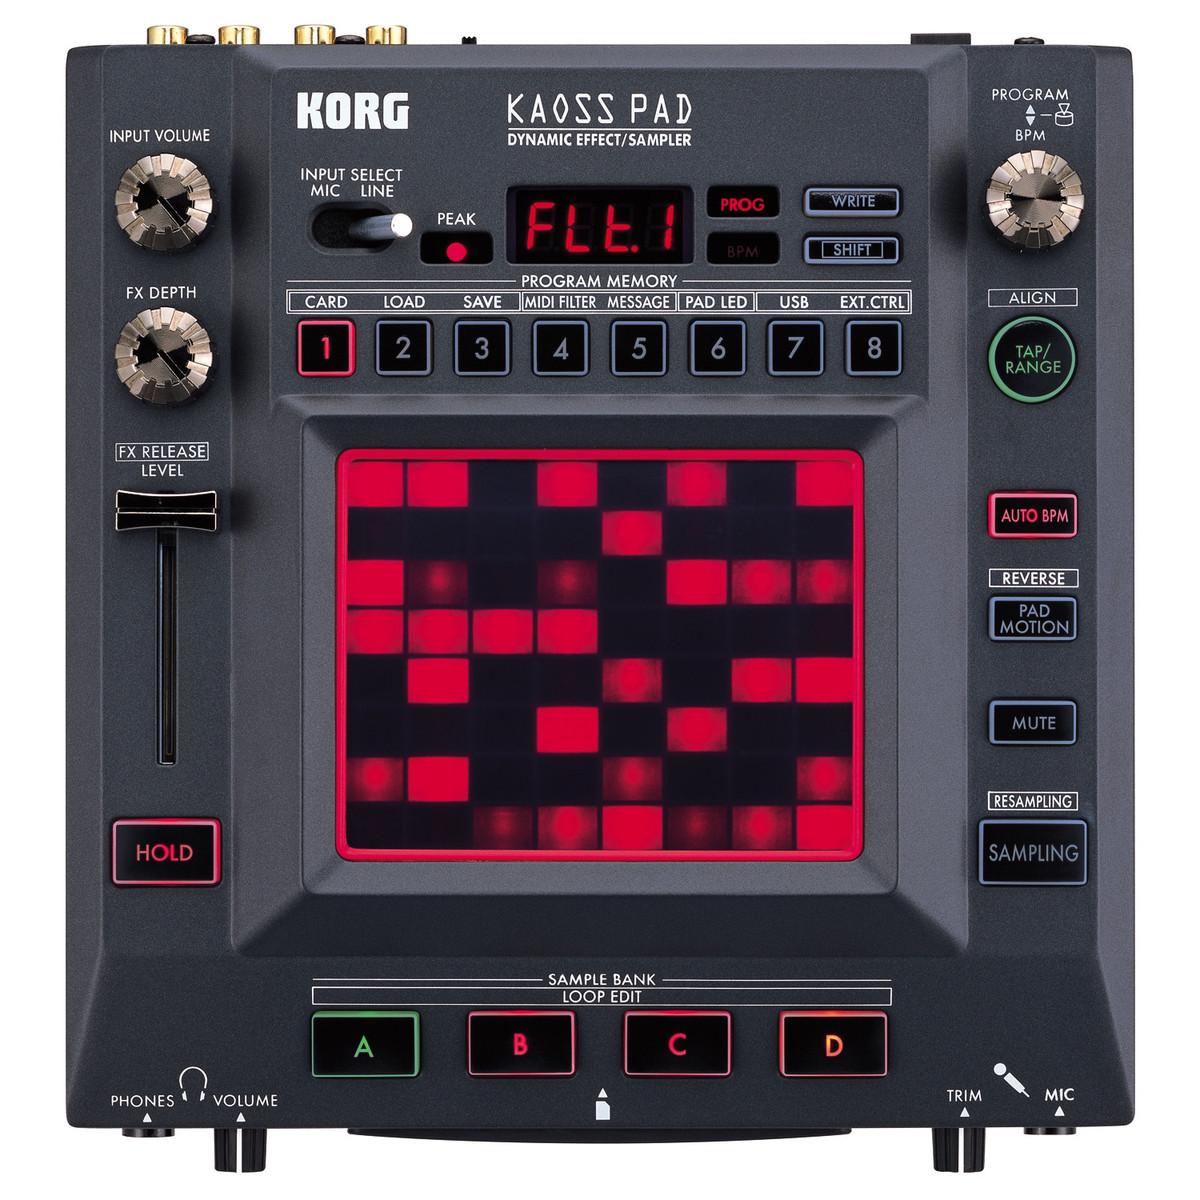 Korg Kaoss Pad KP3+ Dynamic Effects/Sampler at Gear4music.com